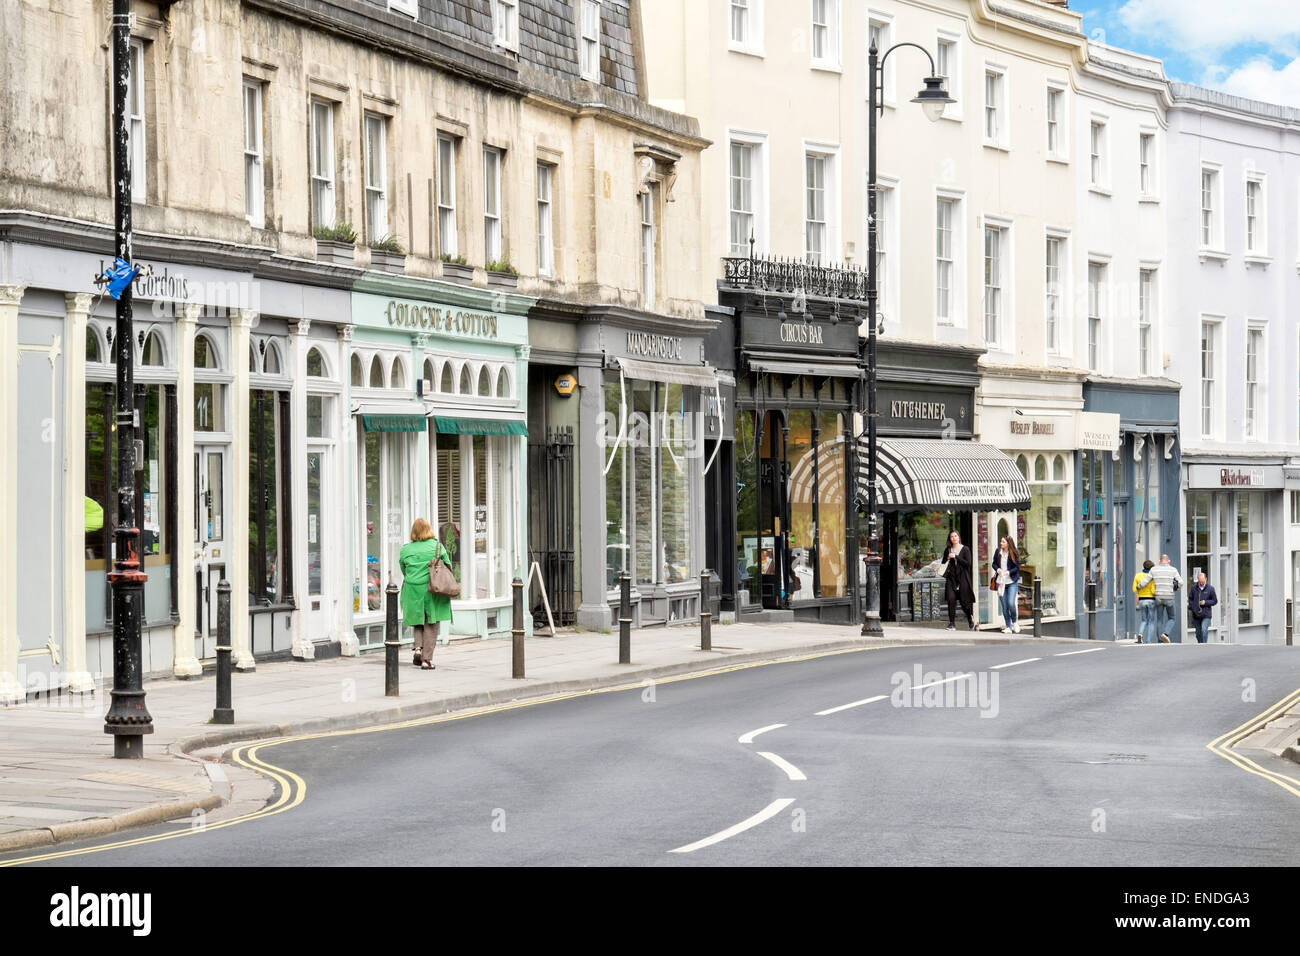 shops street at montpellier walk montpellier cheltenham stock photo 82047451 alamy. Black Bedroom Furniture Sets. Home Design Ideas